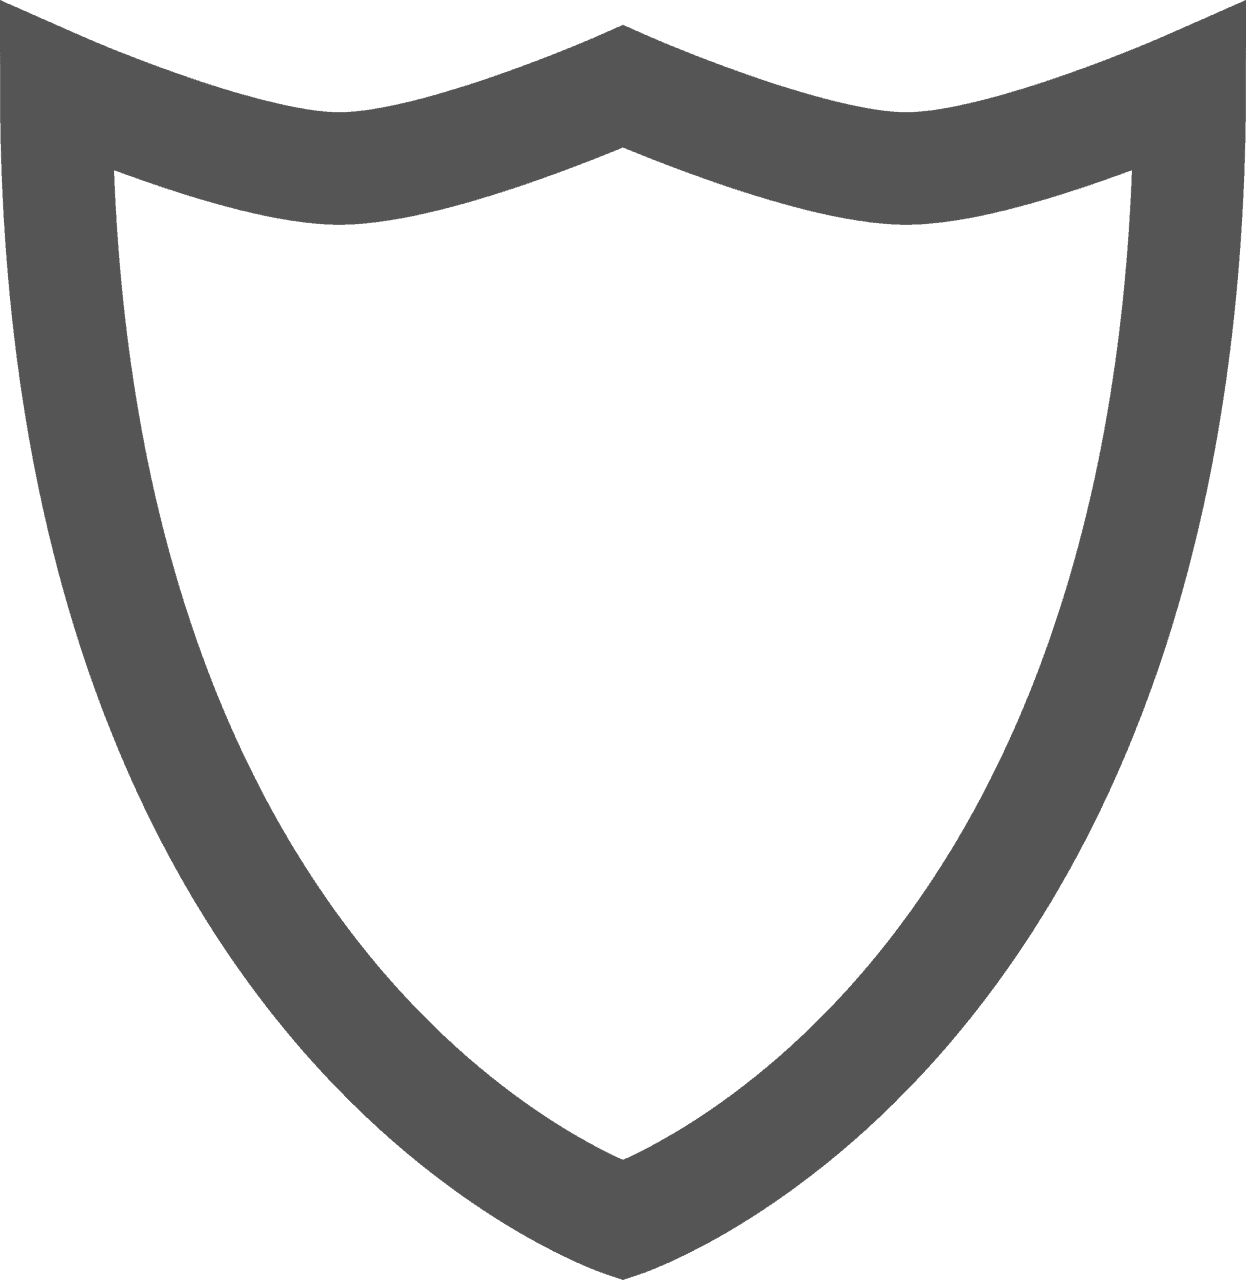 shield, protection, defense